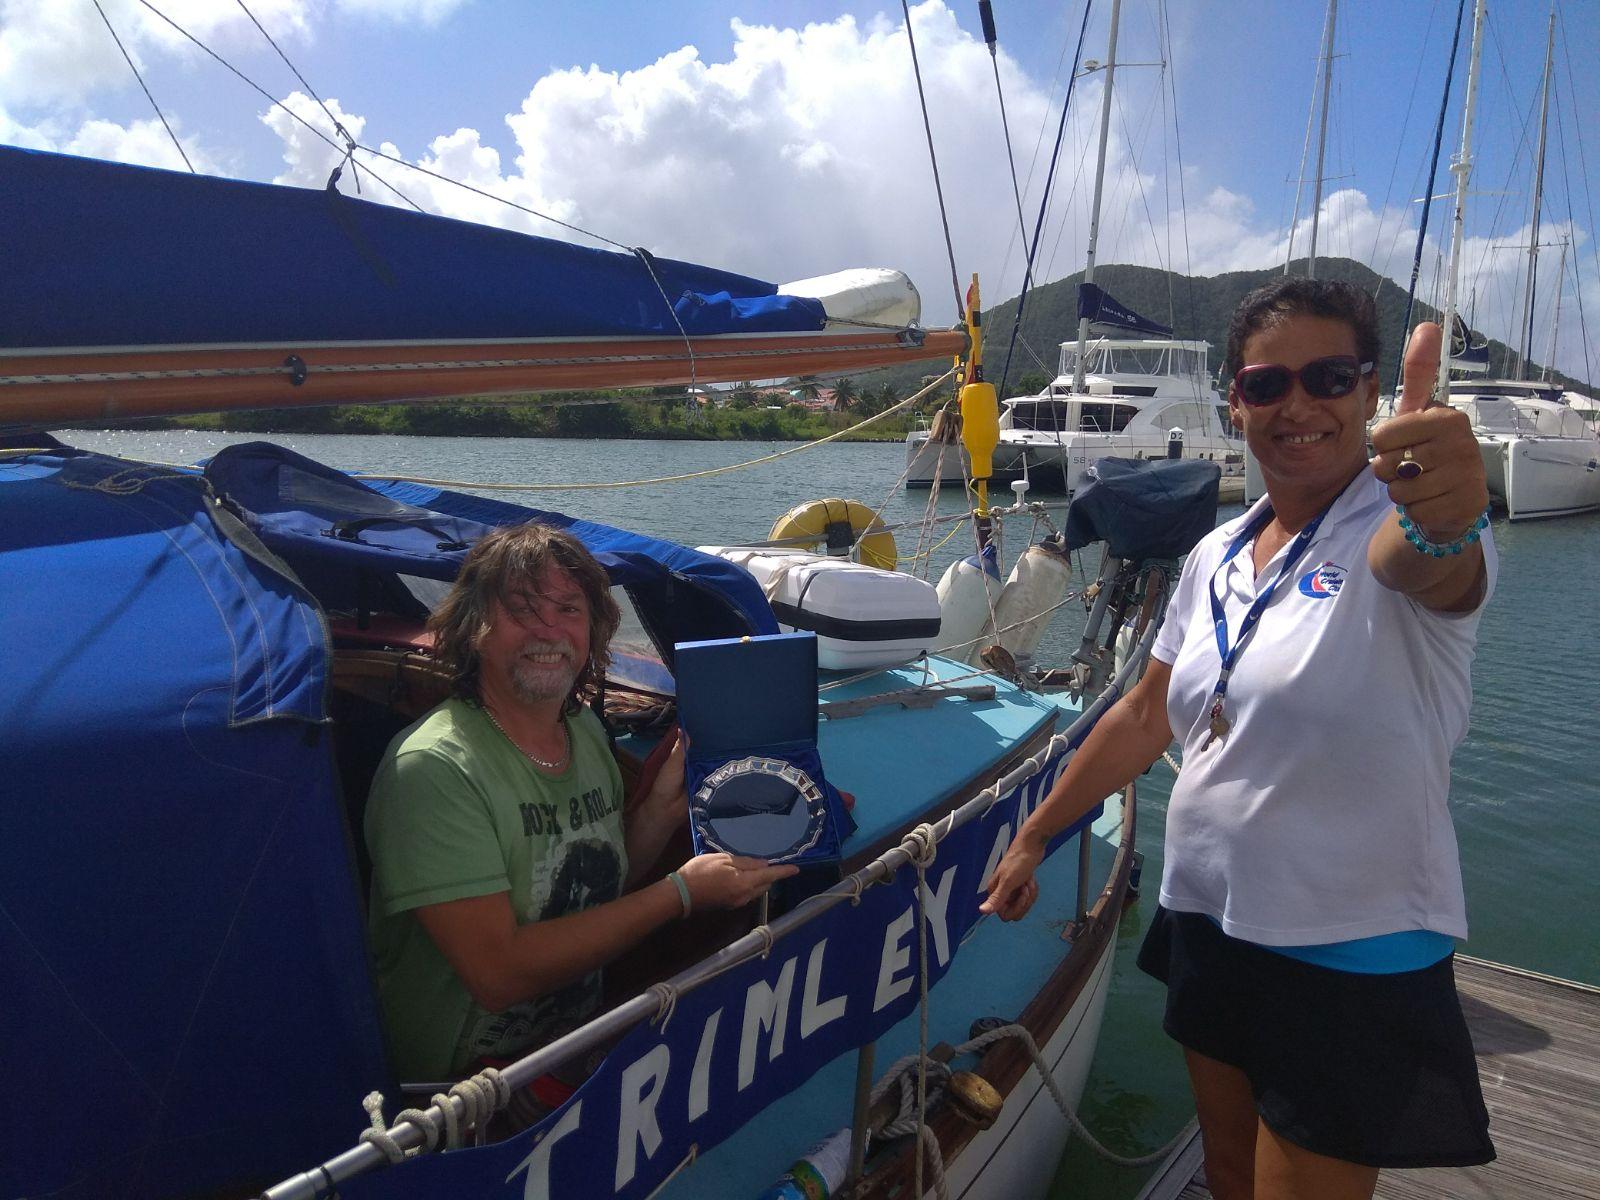 WCC's Peta Cozier with Trimley Maid